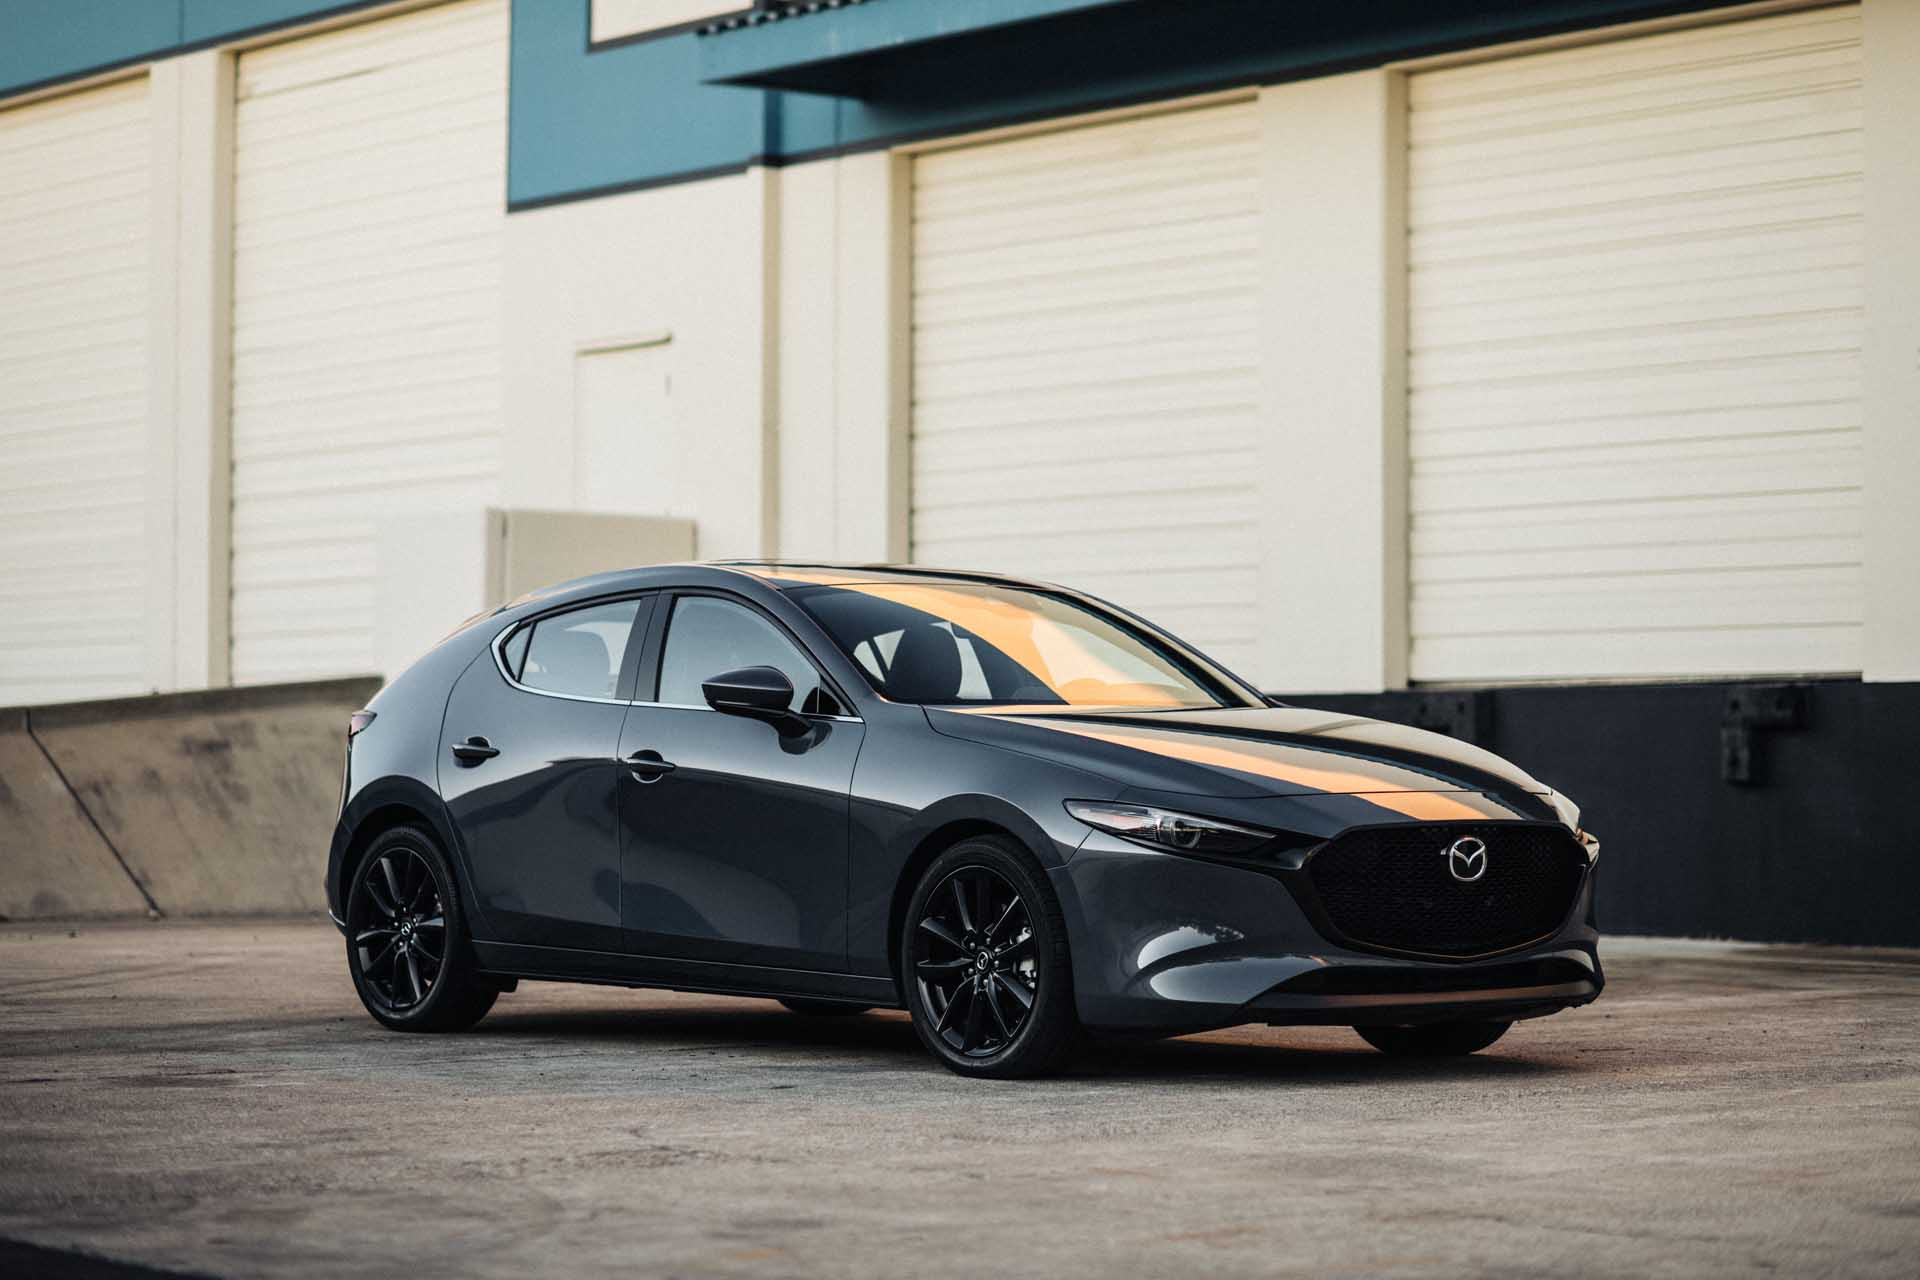 Kekurangan Mazda A3 Spesifikasi